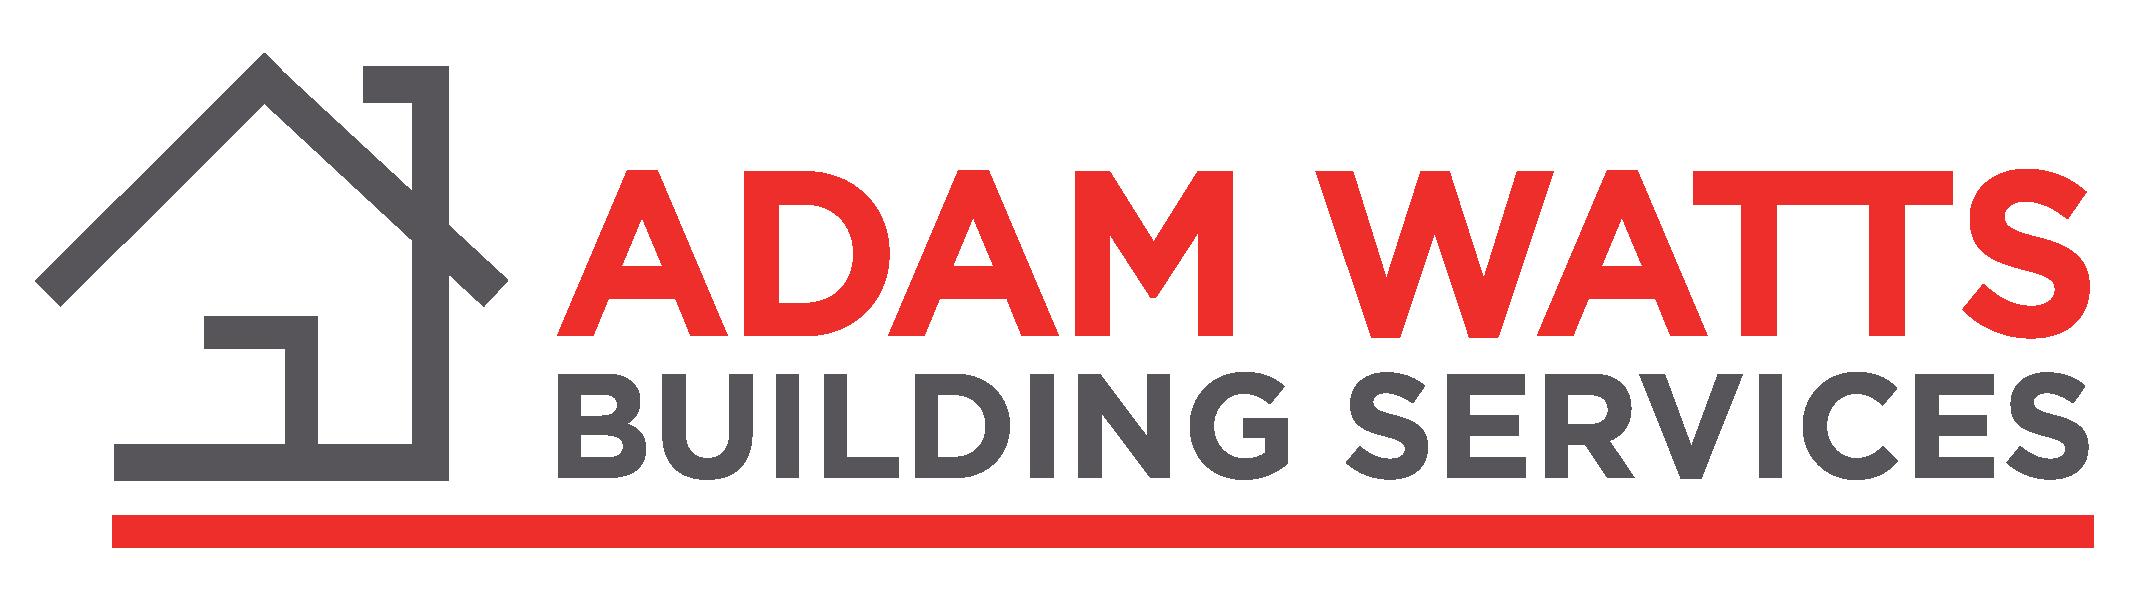 Adam Watts Building Services